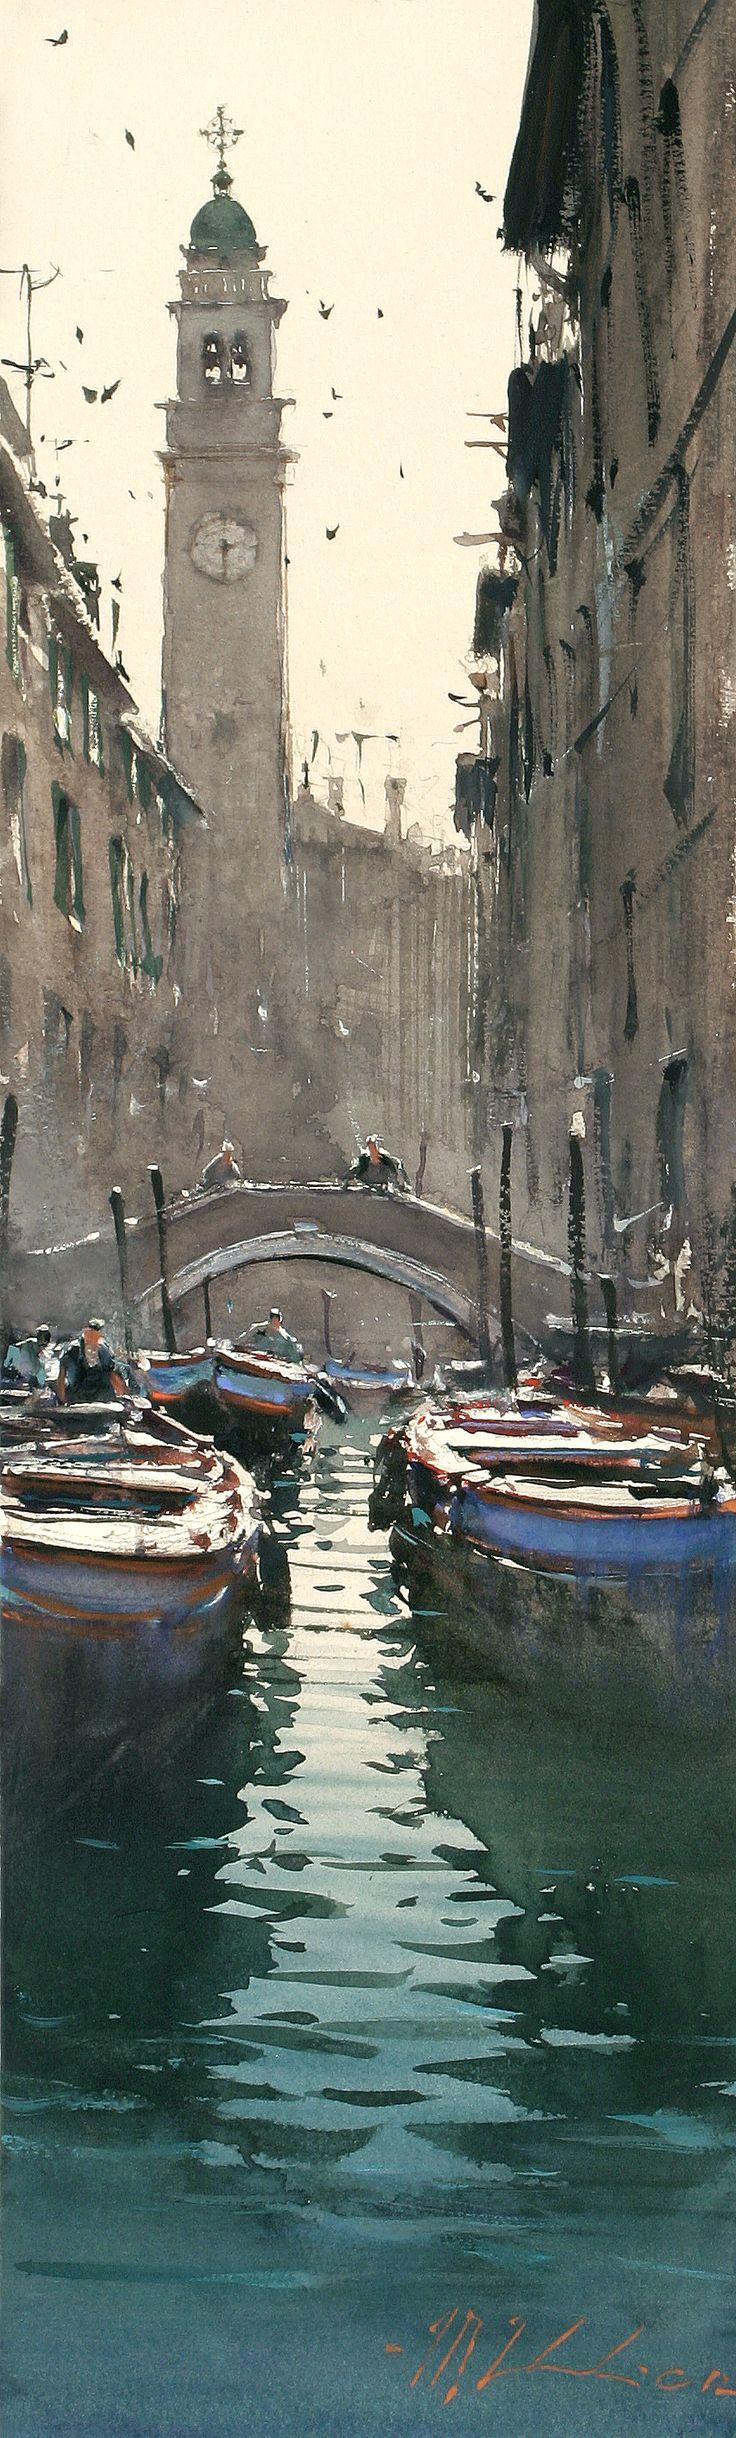 Joseph Zbukvic ~ International Masters - Barges, Venice - Watercolor